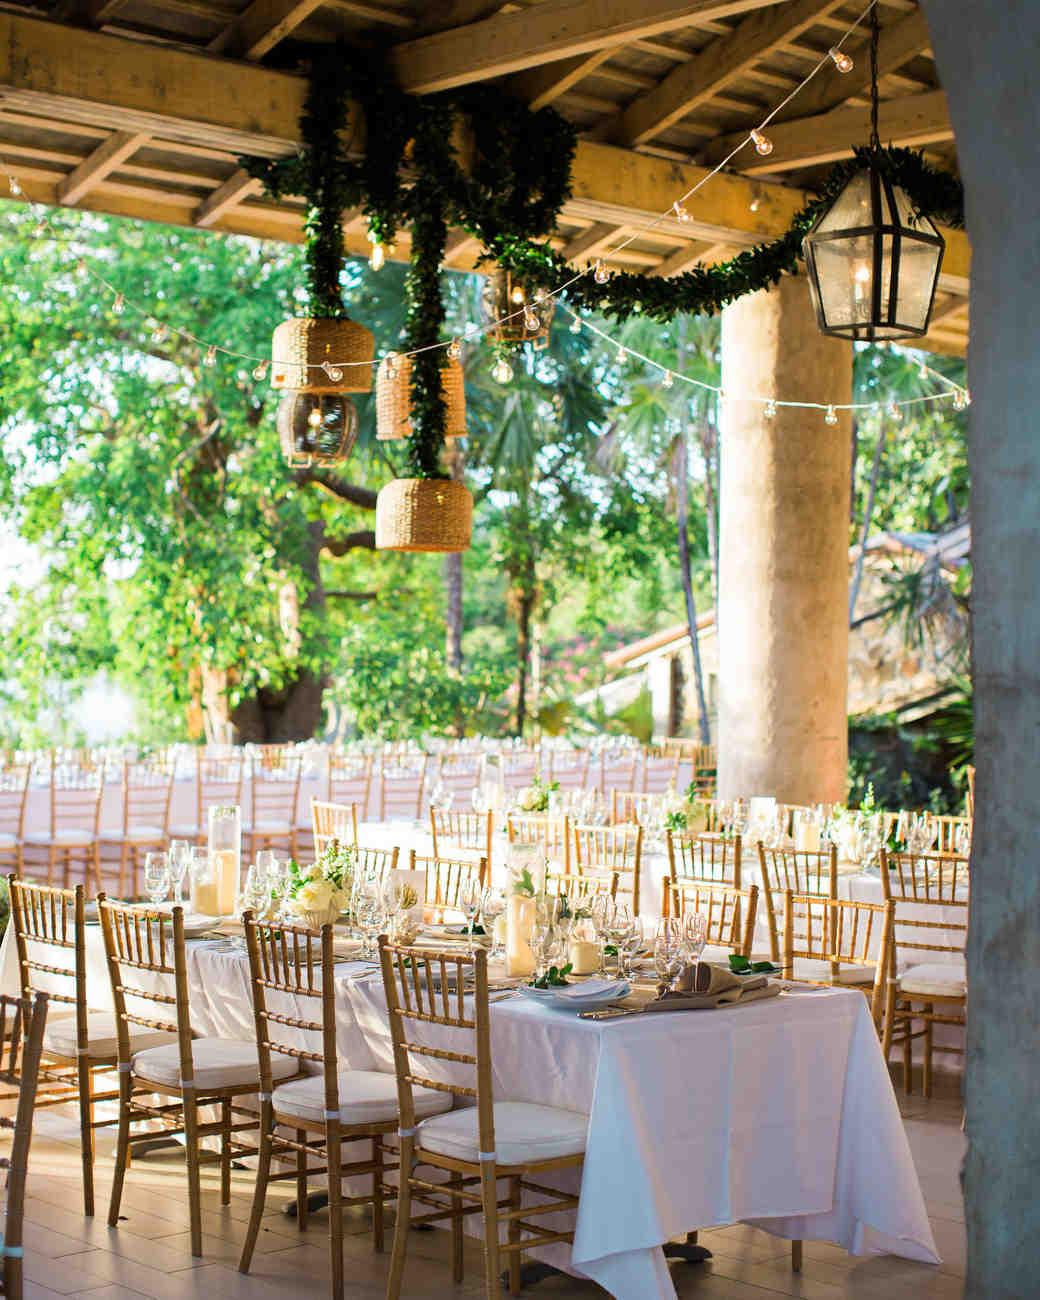 sophie-adam-wedding-reception-rp14-6238580-0117